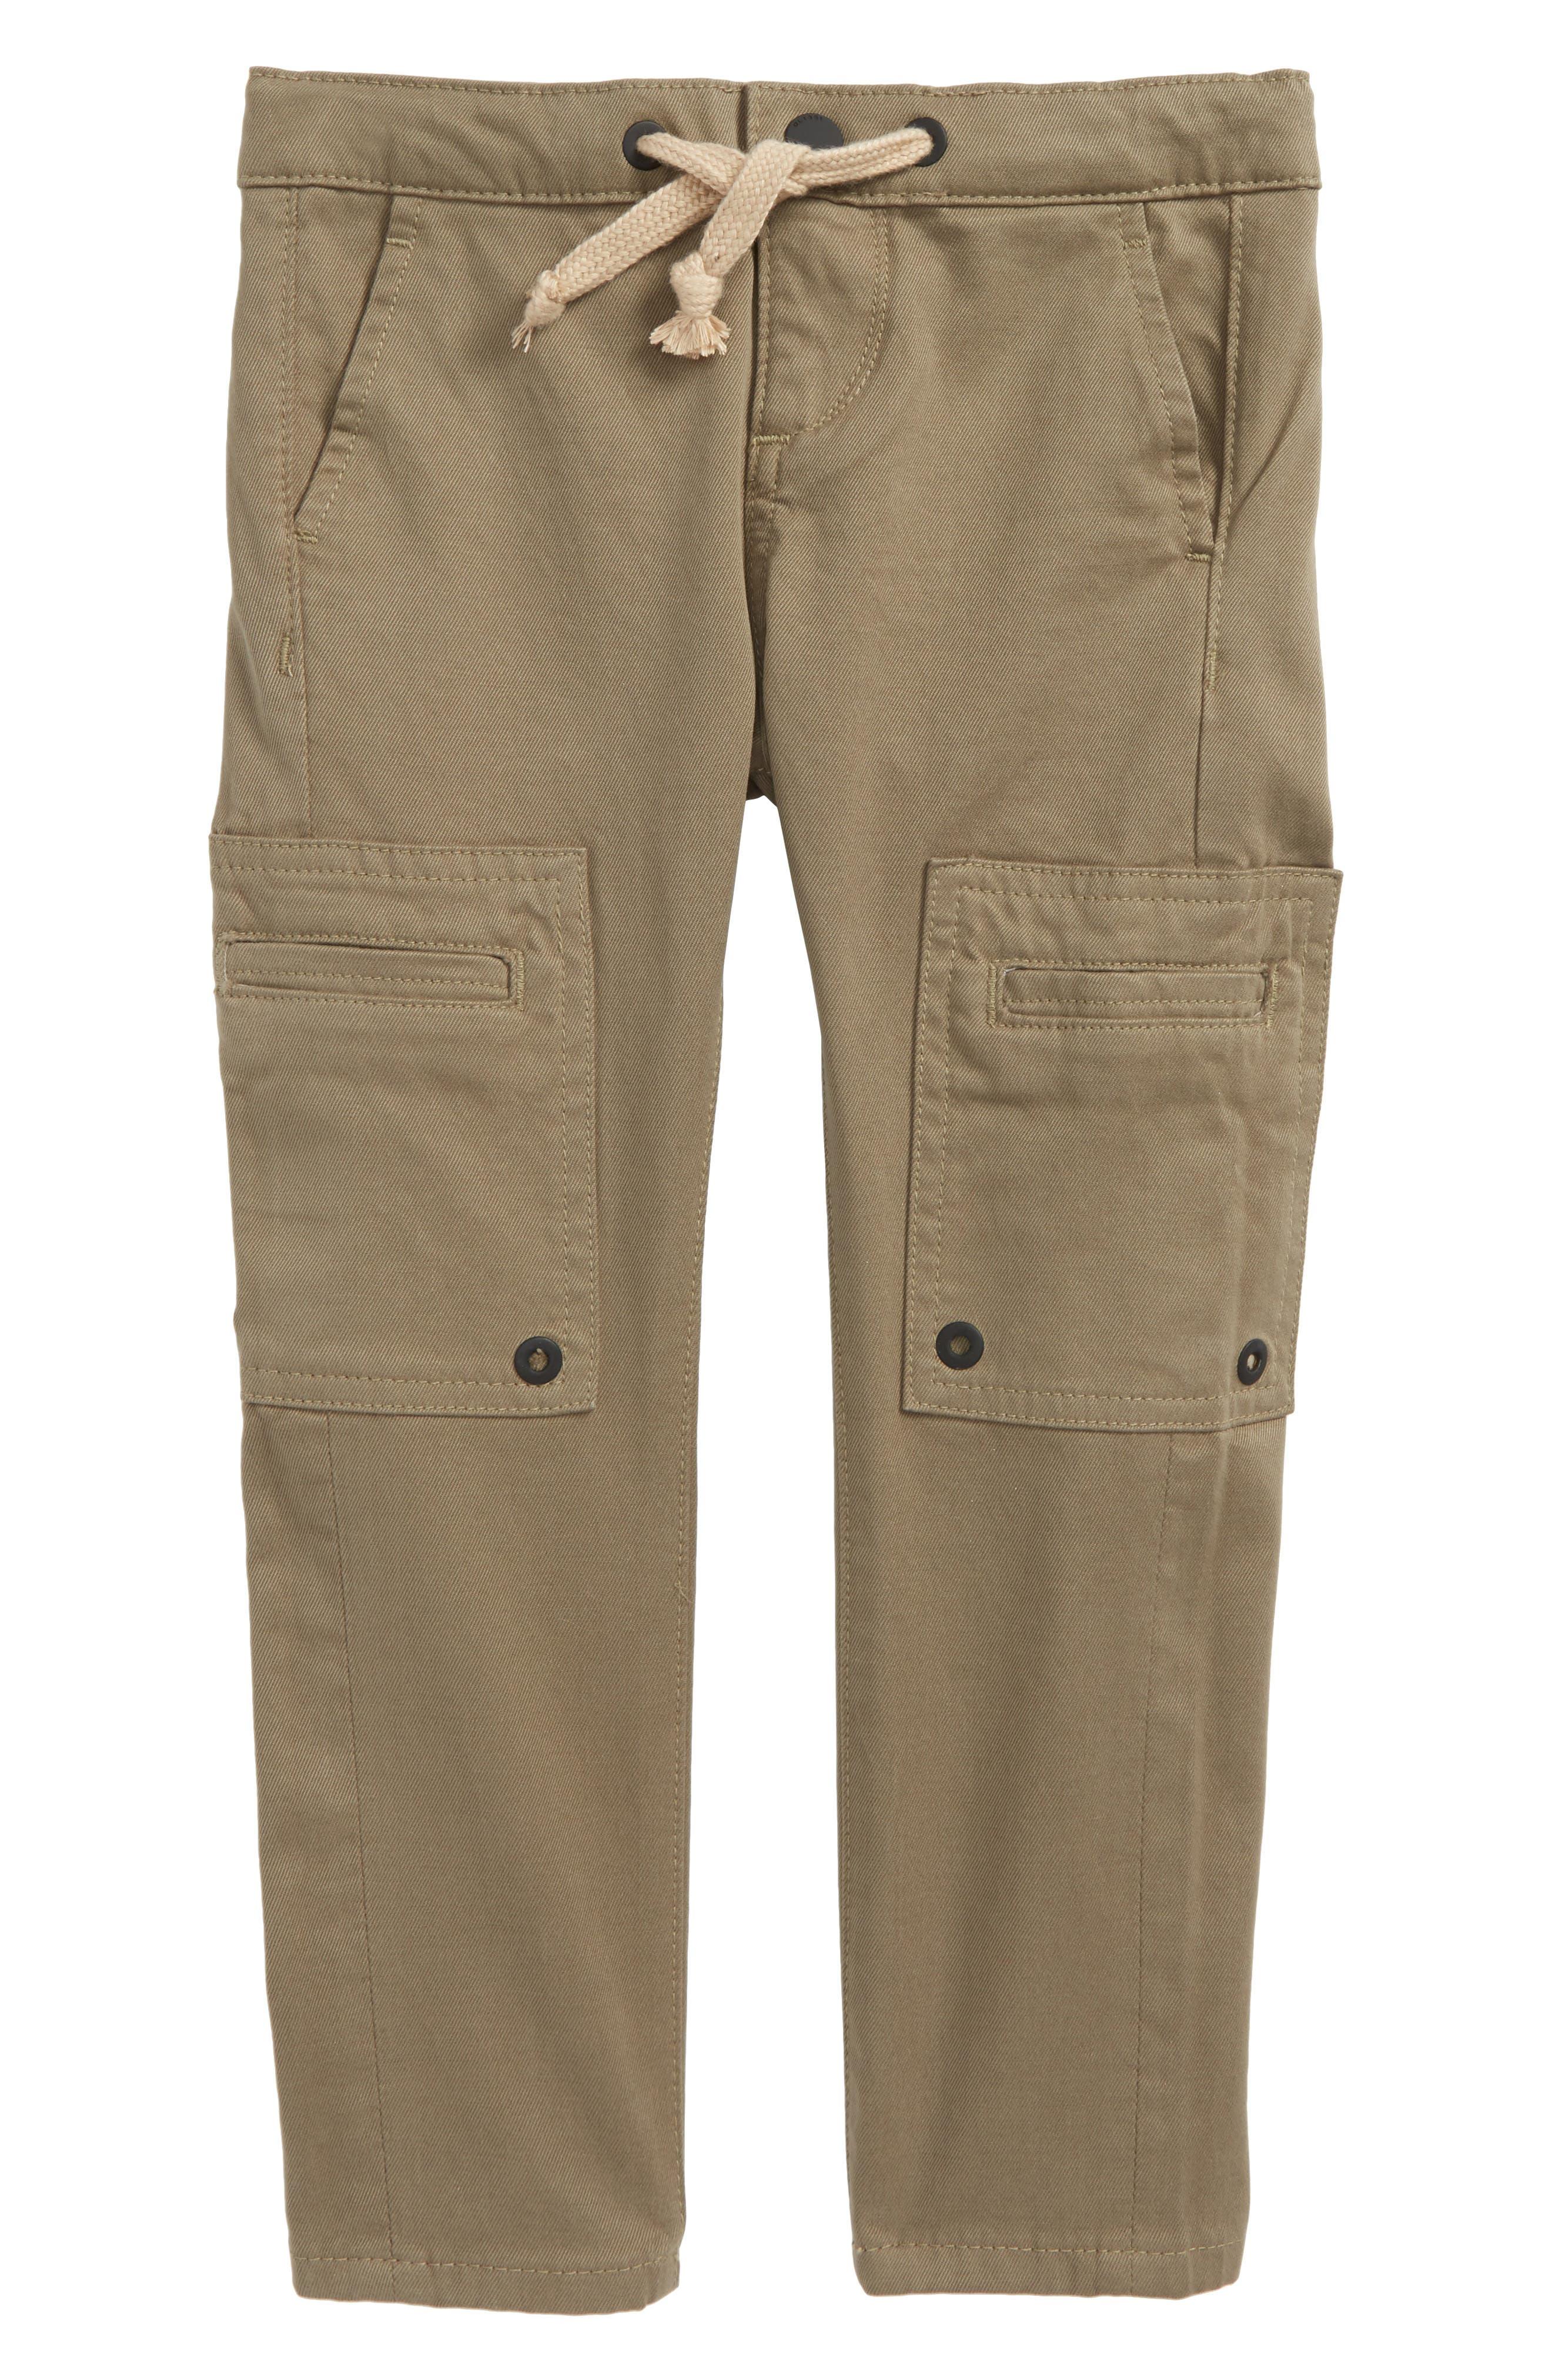 Eddy Slim Fit Chino Pants,                         Main,                         color, 300